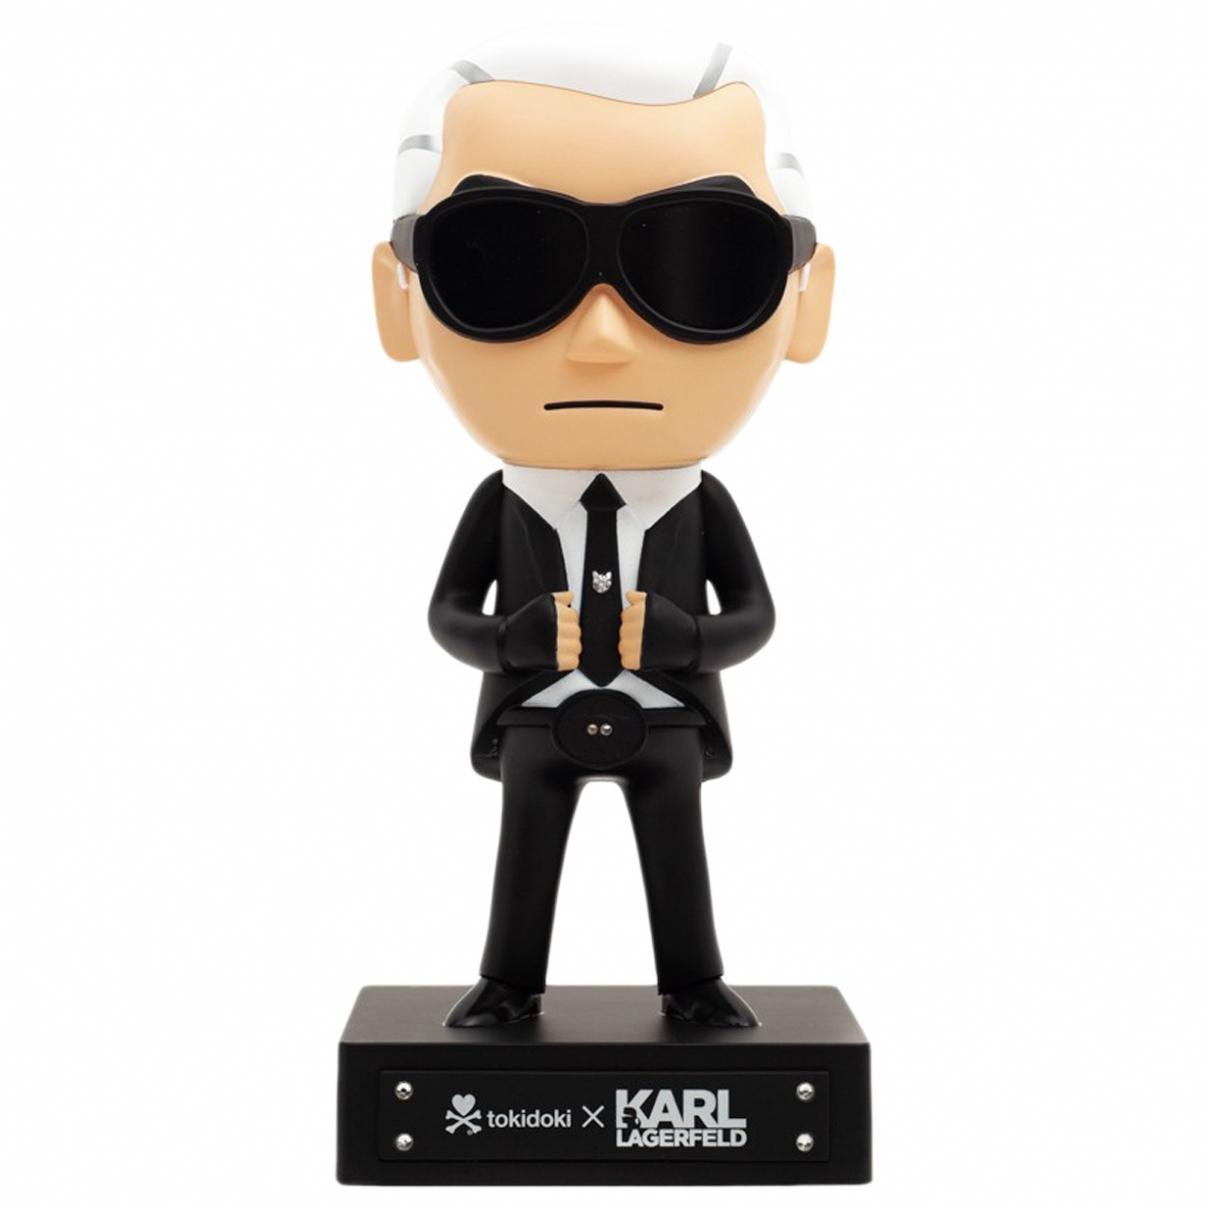 Karl Lagerfeld - Objets & Deco   pour lifestyle